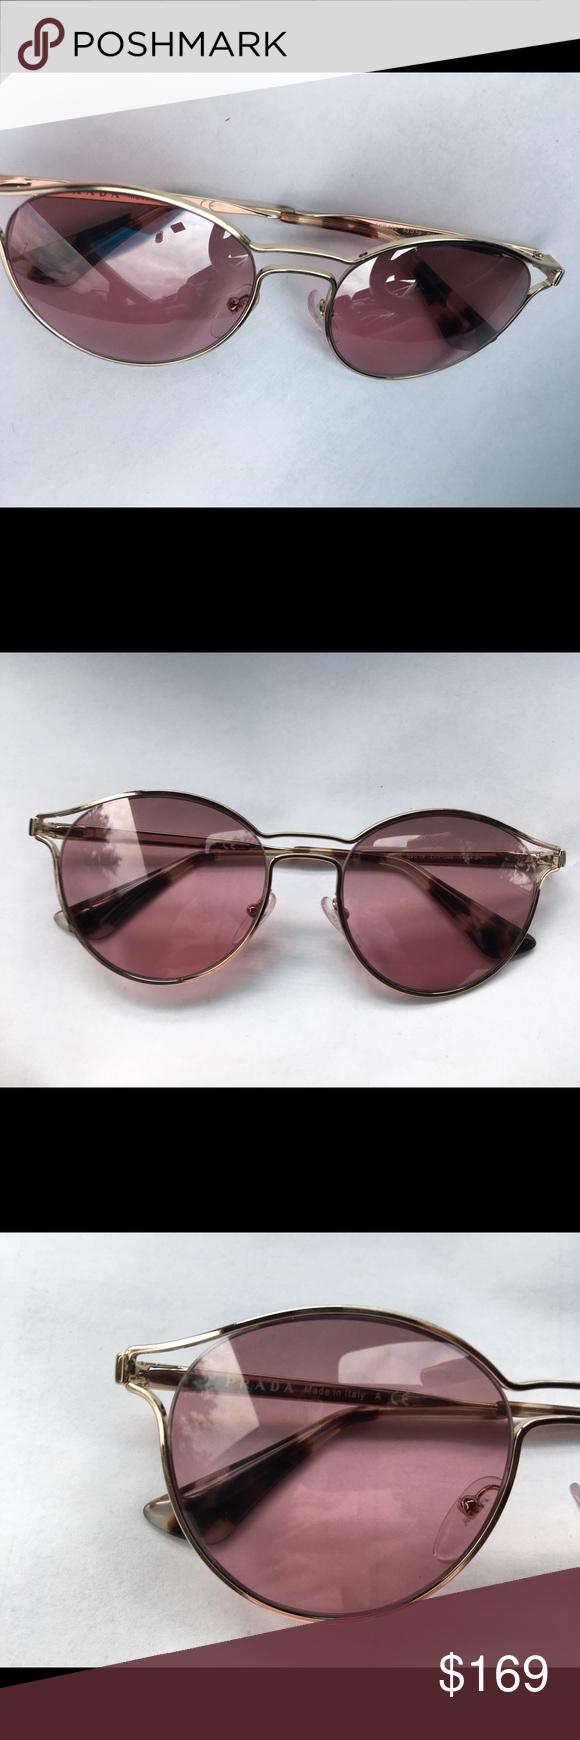 a2e223ea6bf Prada Cinema Sunglasses 🕶 Size  One Size (53-19-140)